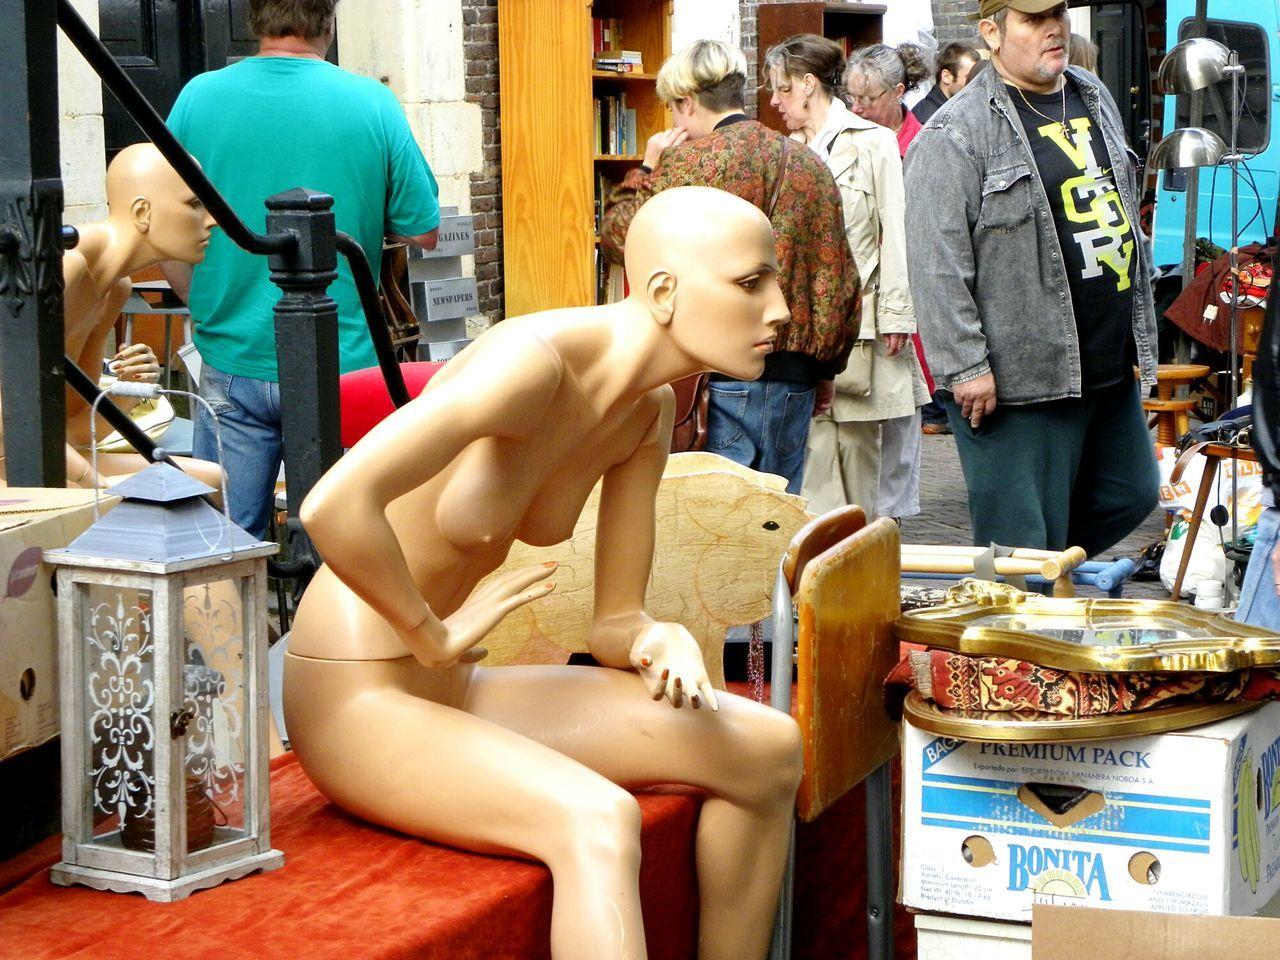 Statue Lifestyles People Sculpture Outdoors Fleamarket Flea Markets Amsterdam City Amsterdam Amsterdam Life